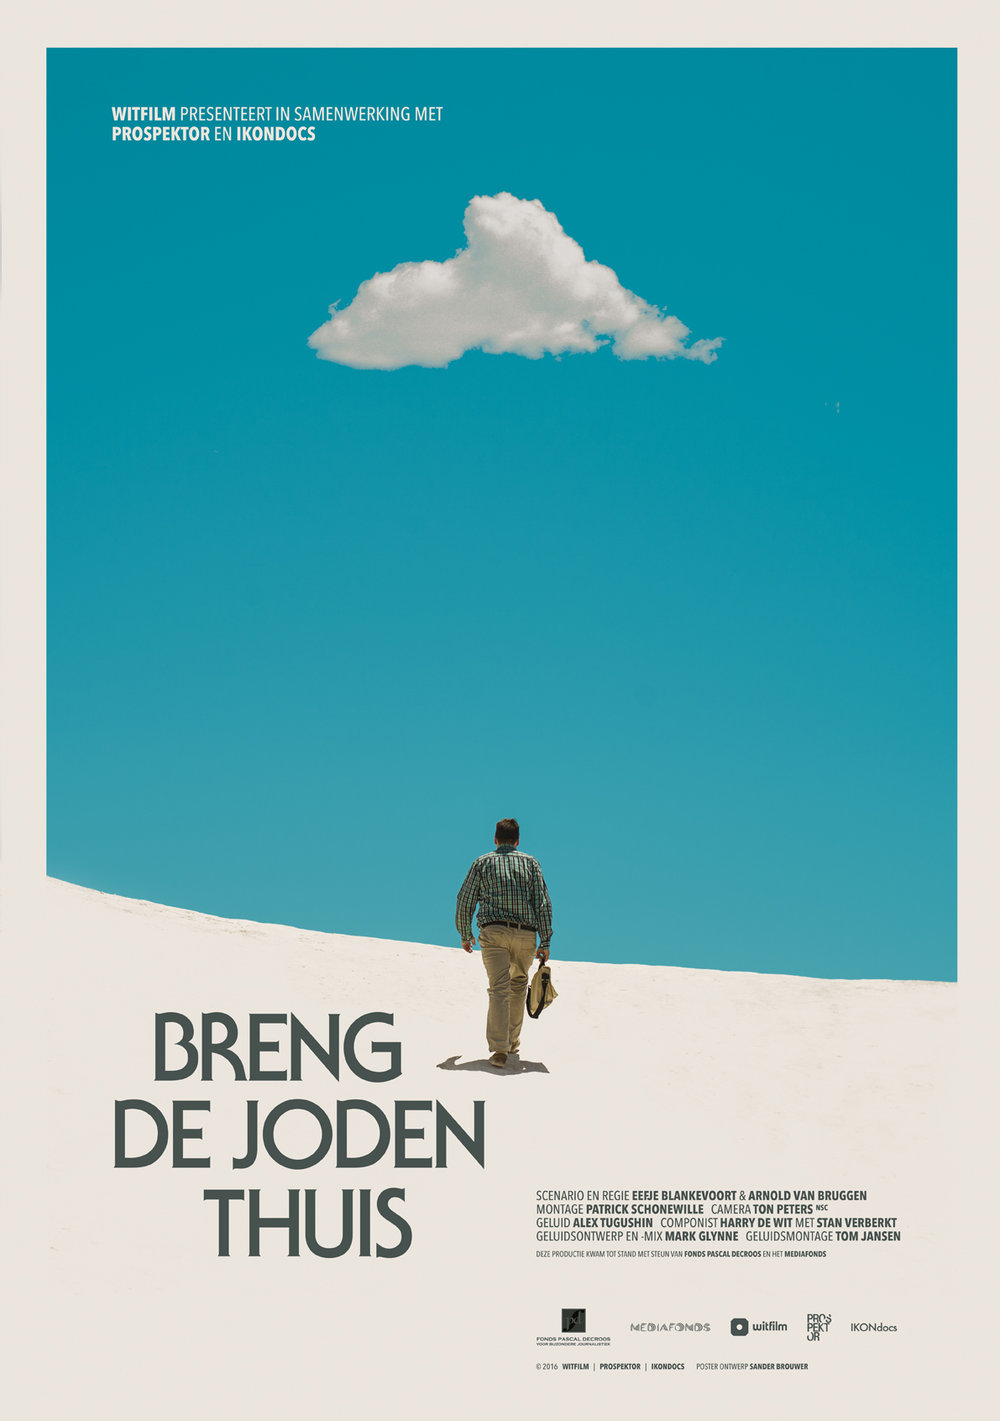 BDJT_Poster_NL_F1 (1).jpg